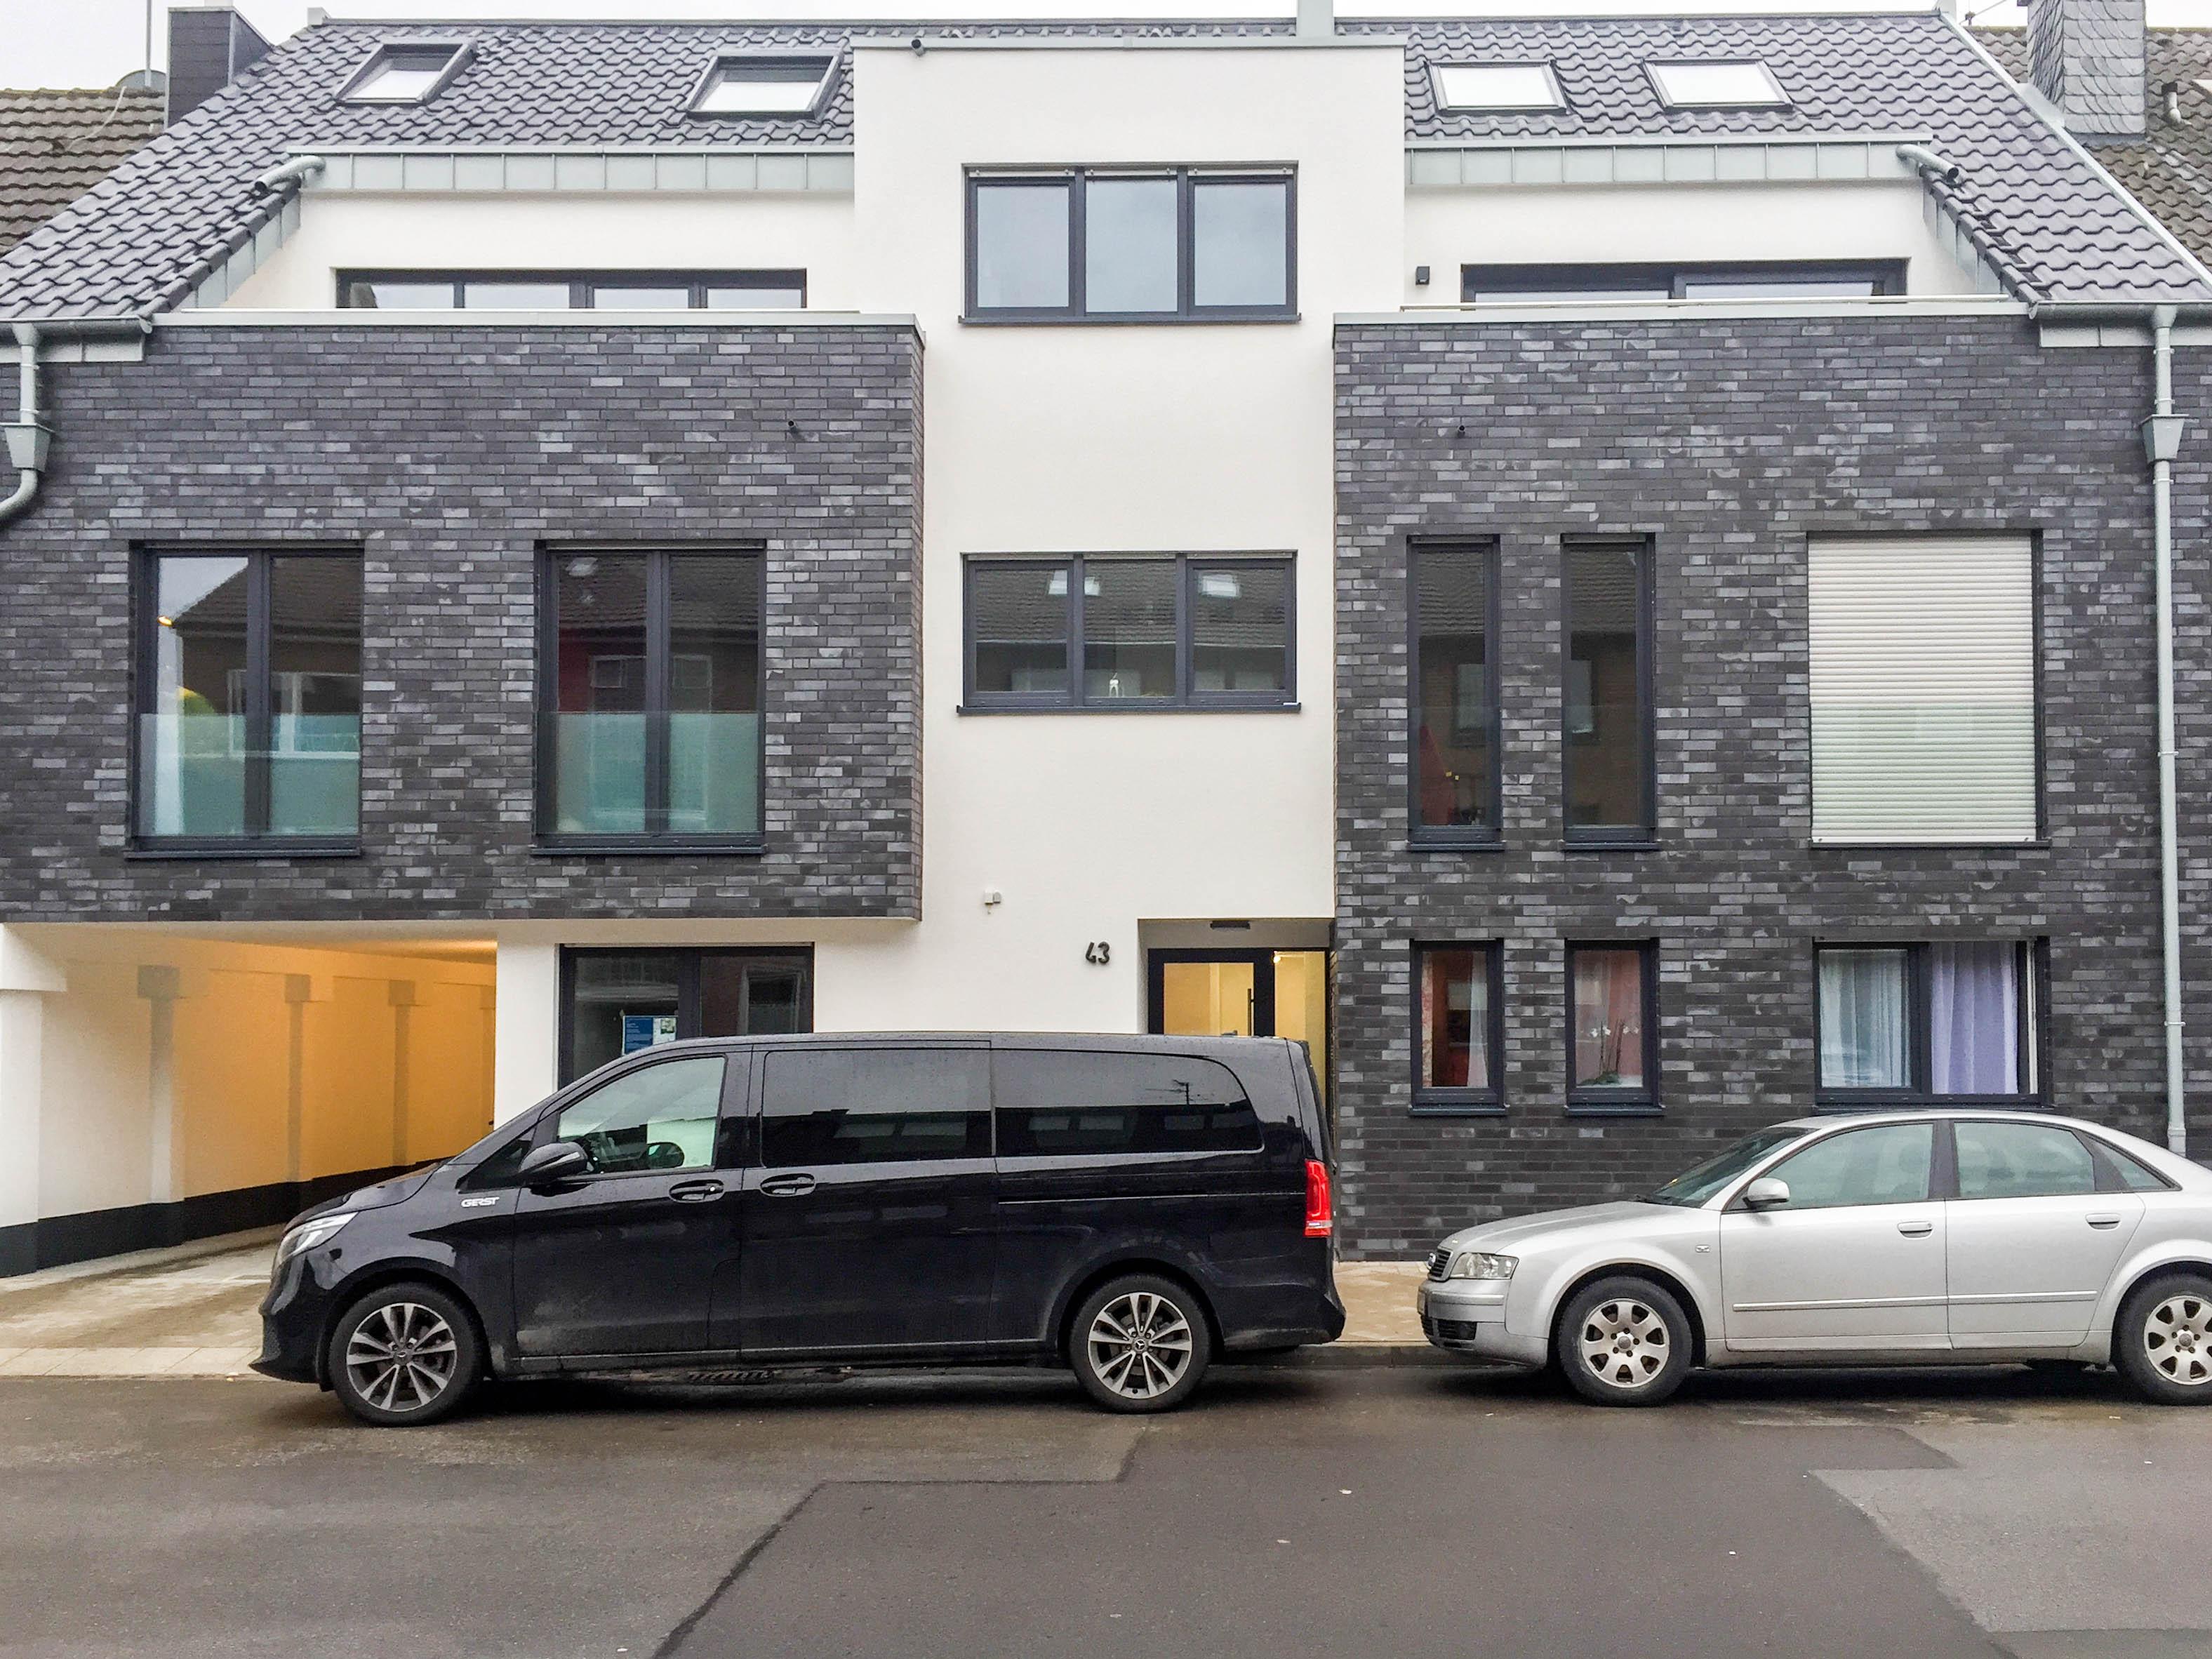 Hübsches Apartment im beliebten Meerbusch-Büderich!